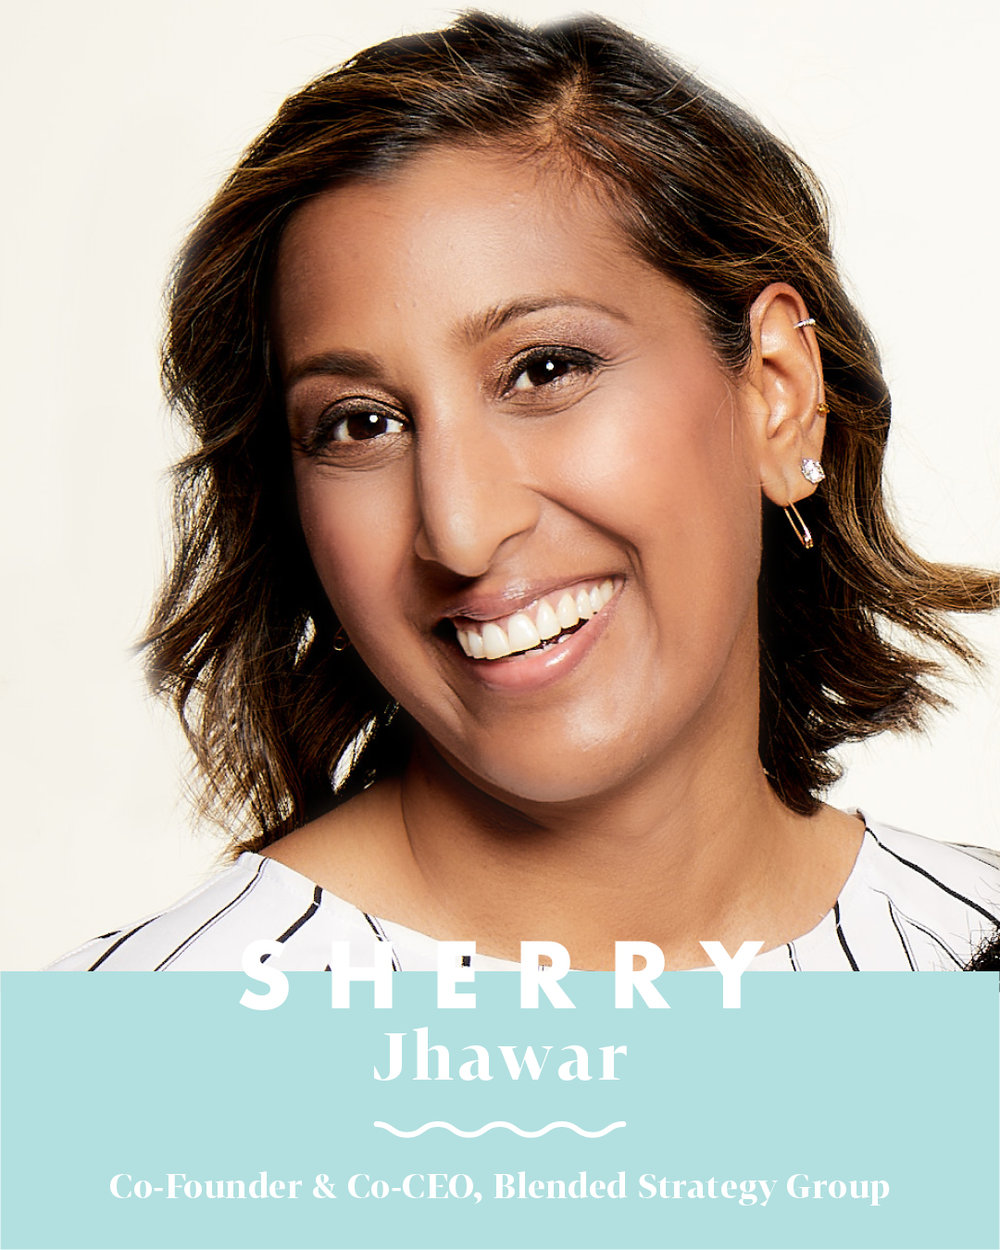 sherry-jhawar.jpg